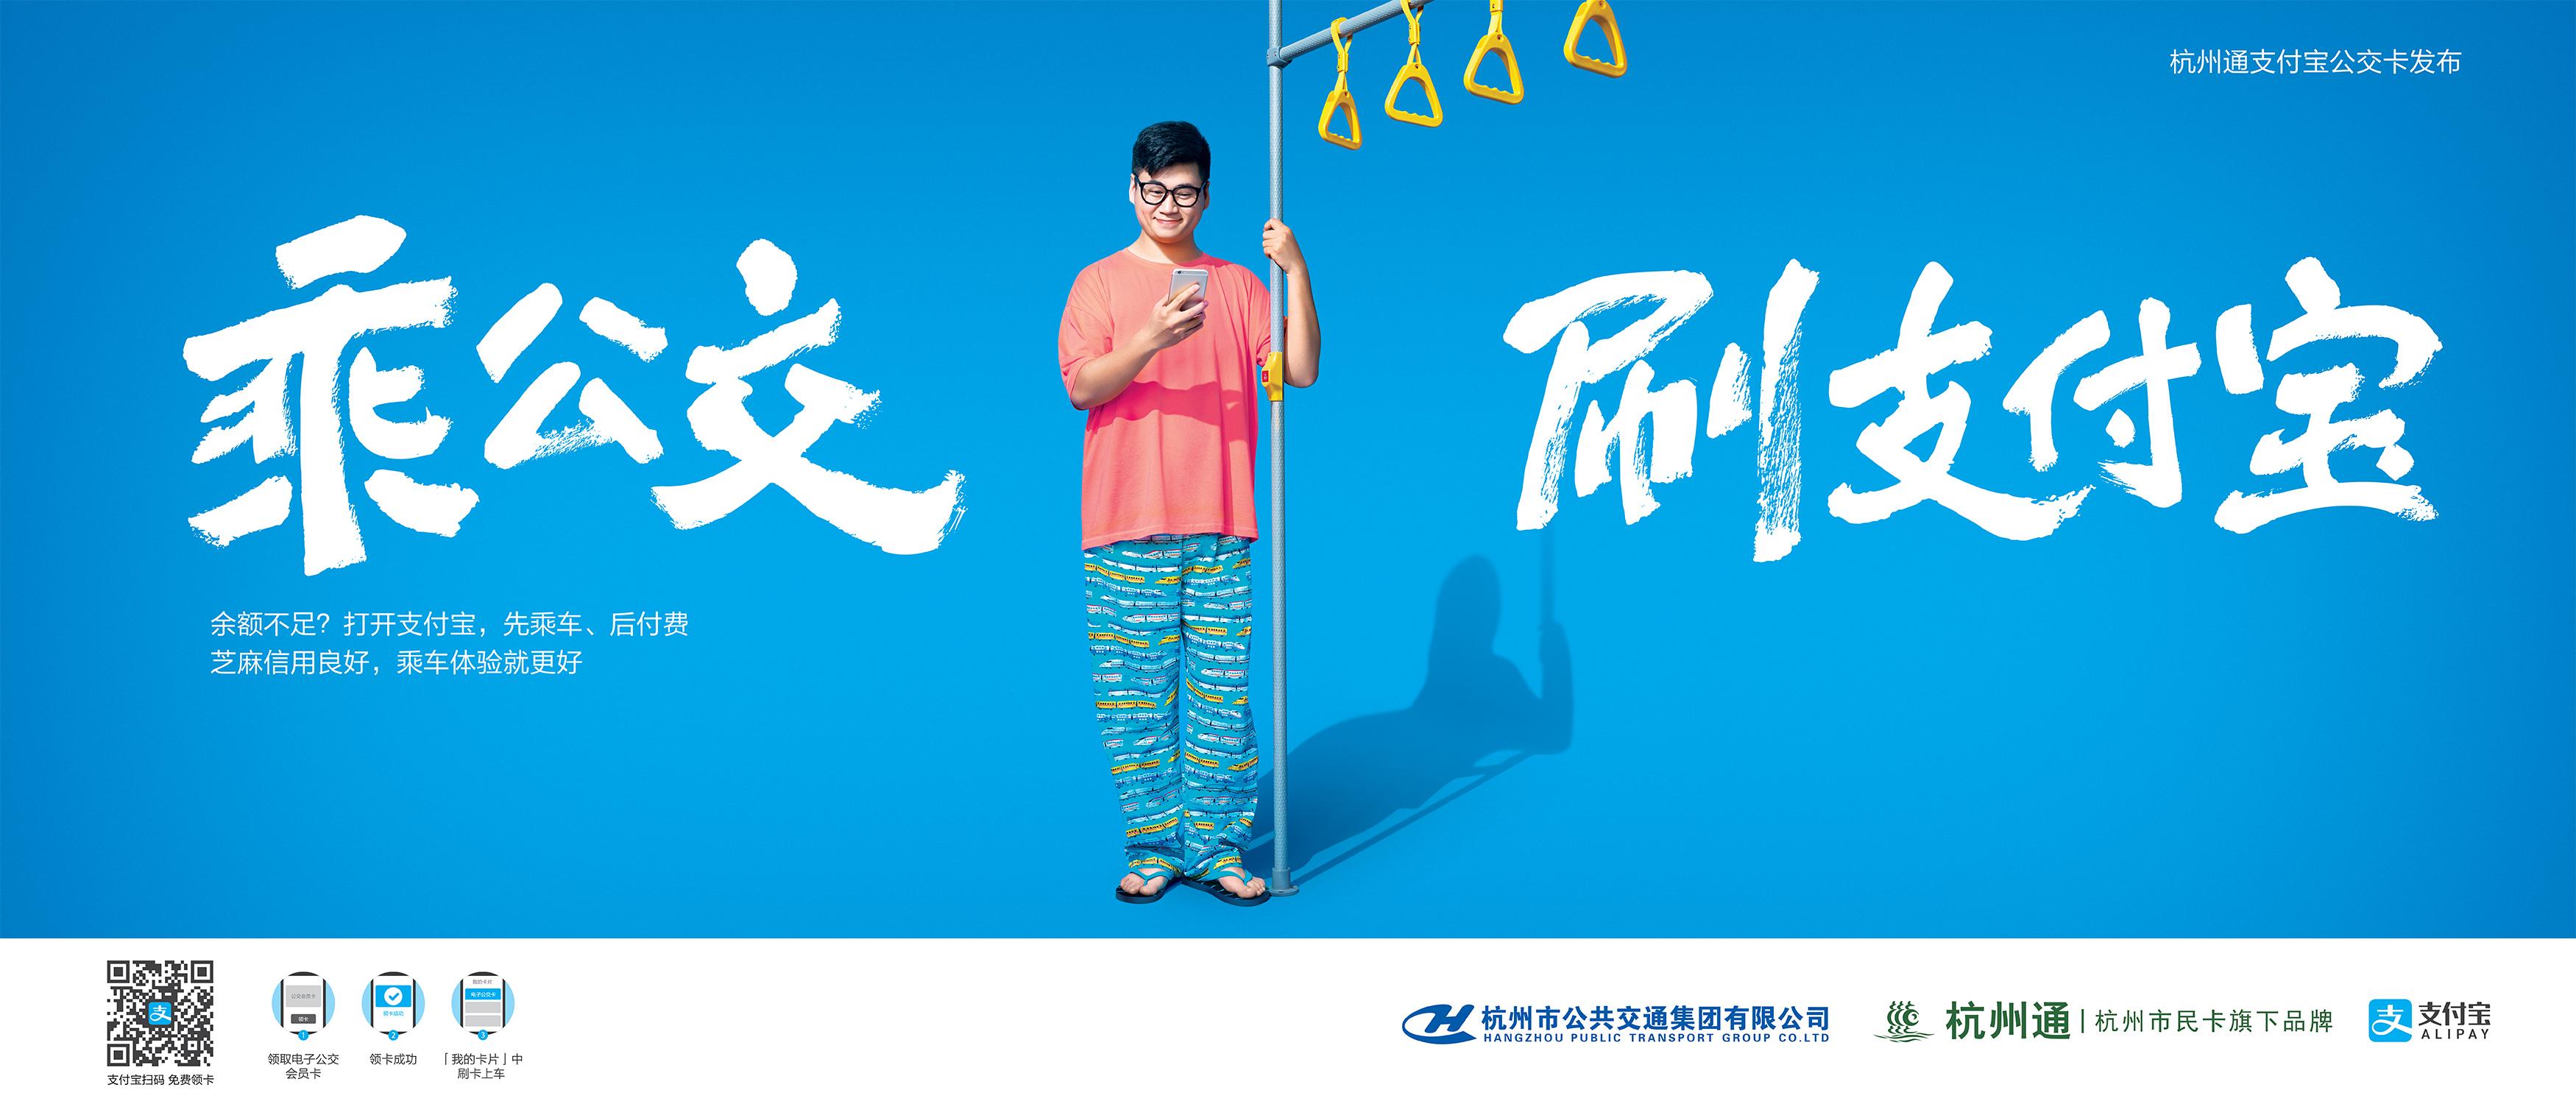 Alipay_Hangzhou Bus_Pajama Guy